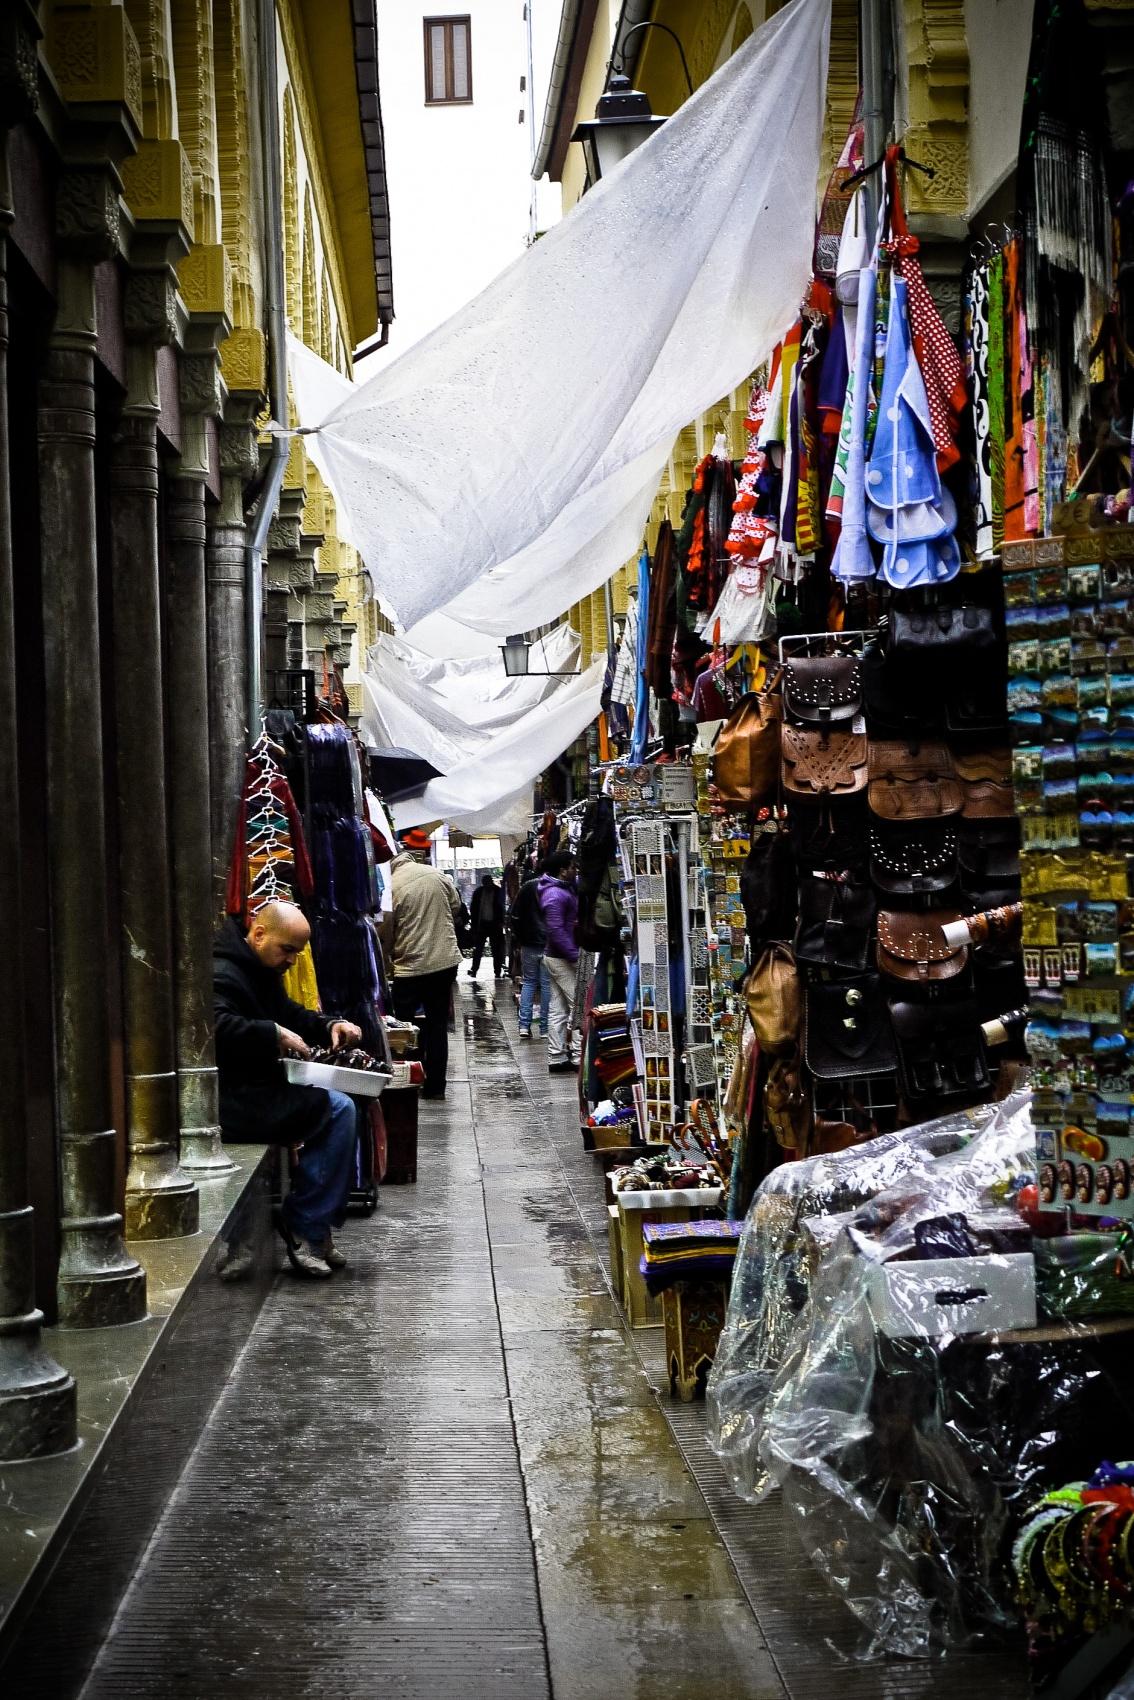 Caught In Time - Granada